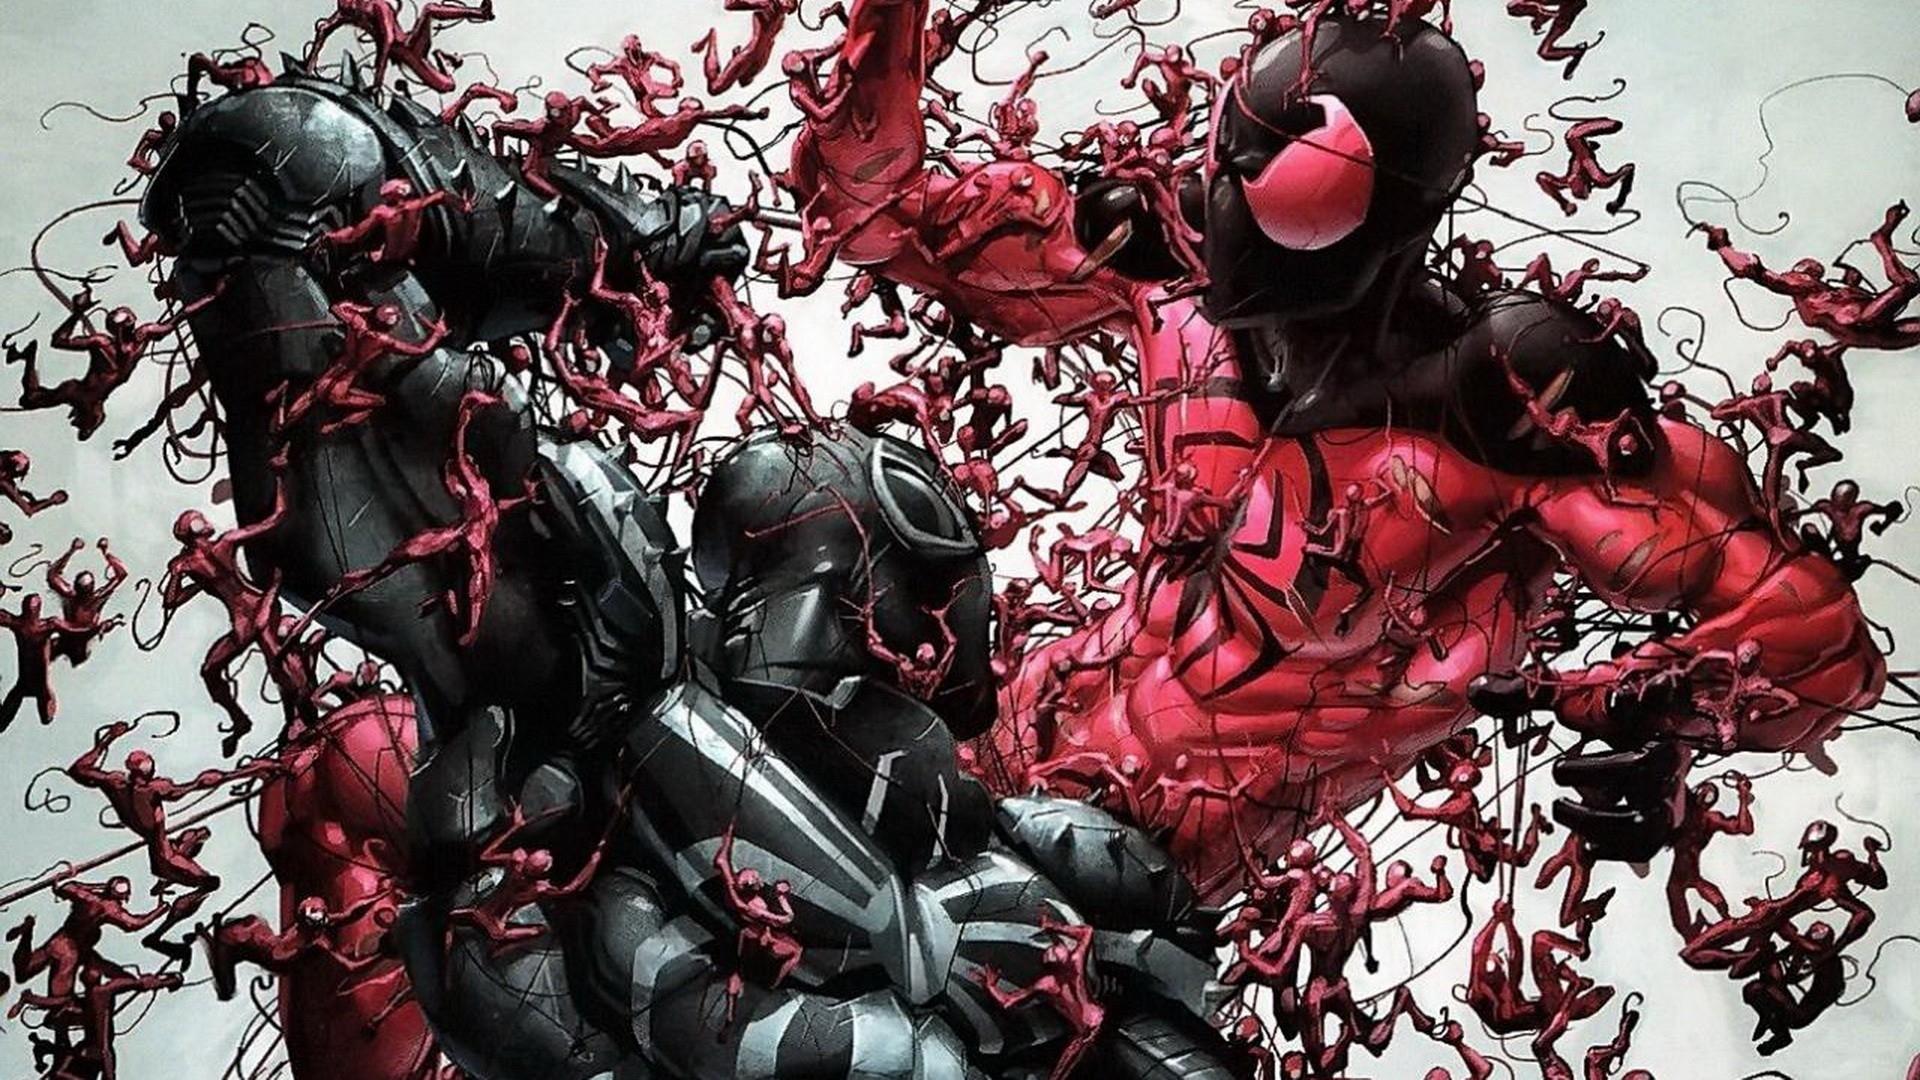 carnage marvel comics marvel scarlet spider 1920x1080 wallpaper Art HD 1920x1080